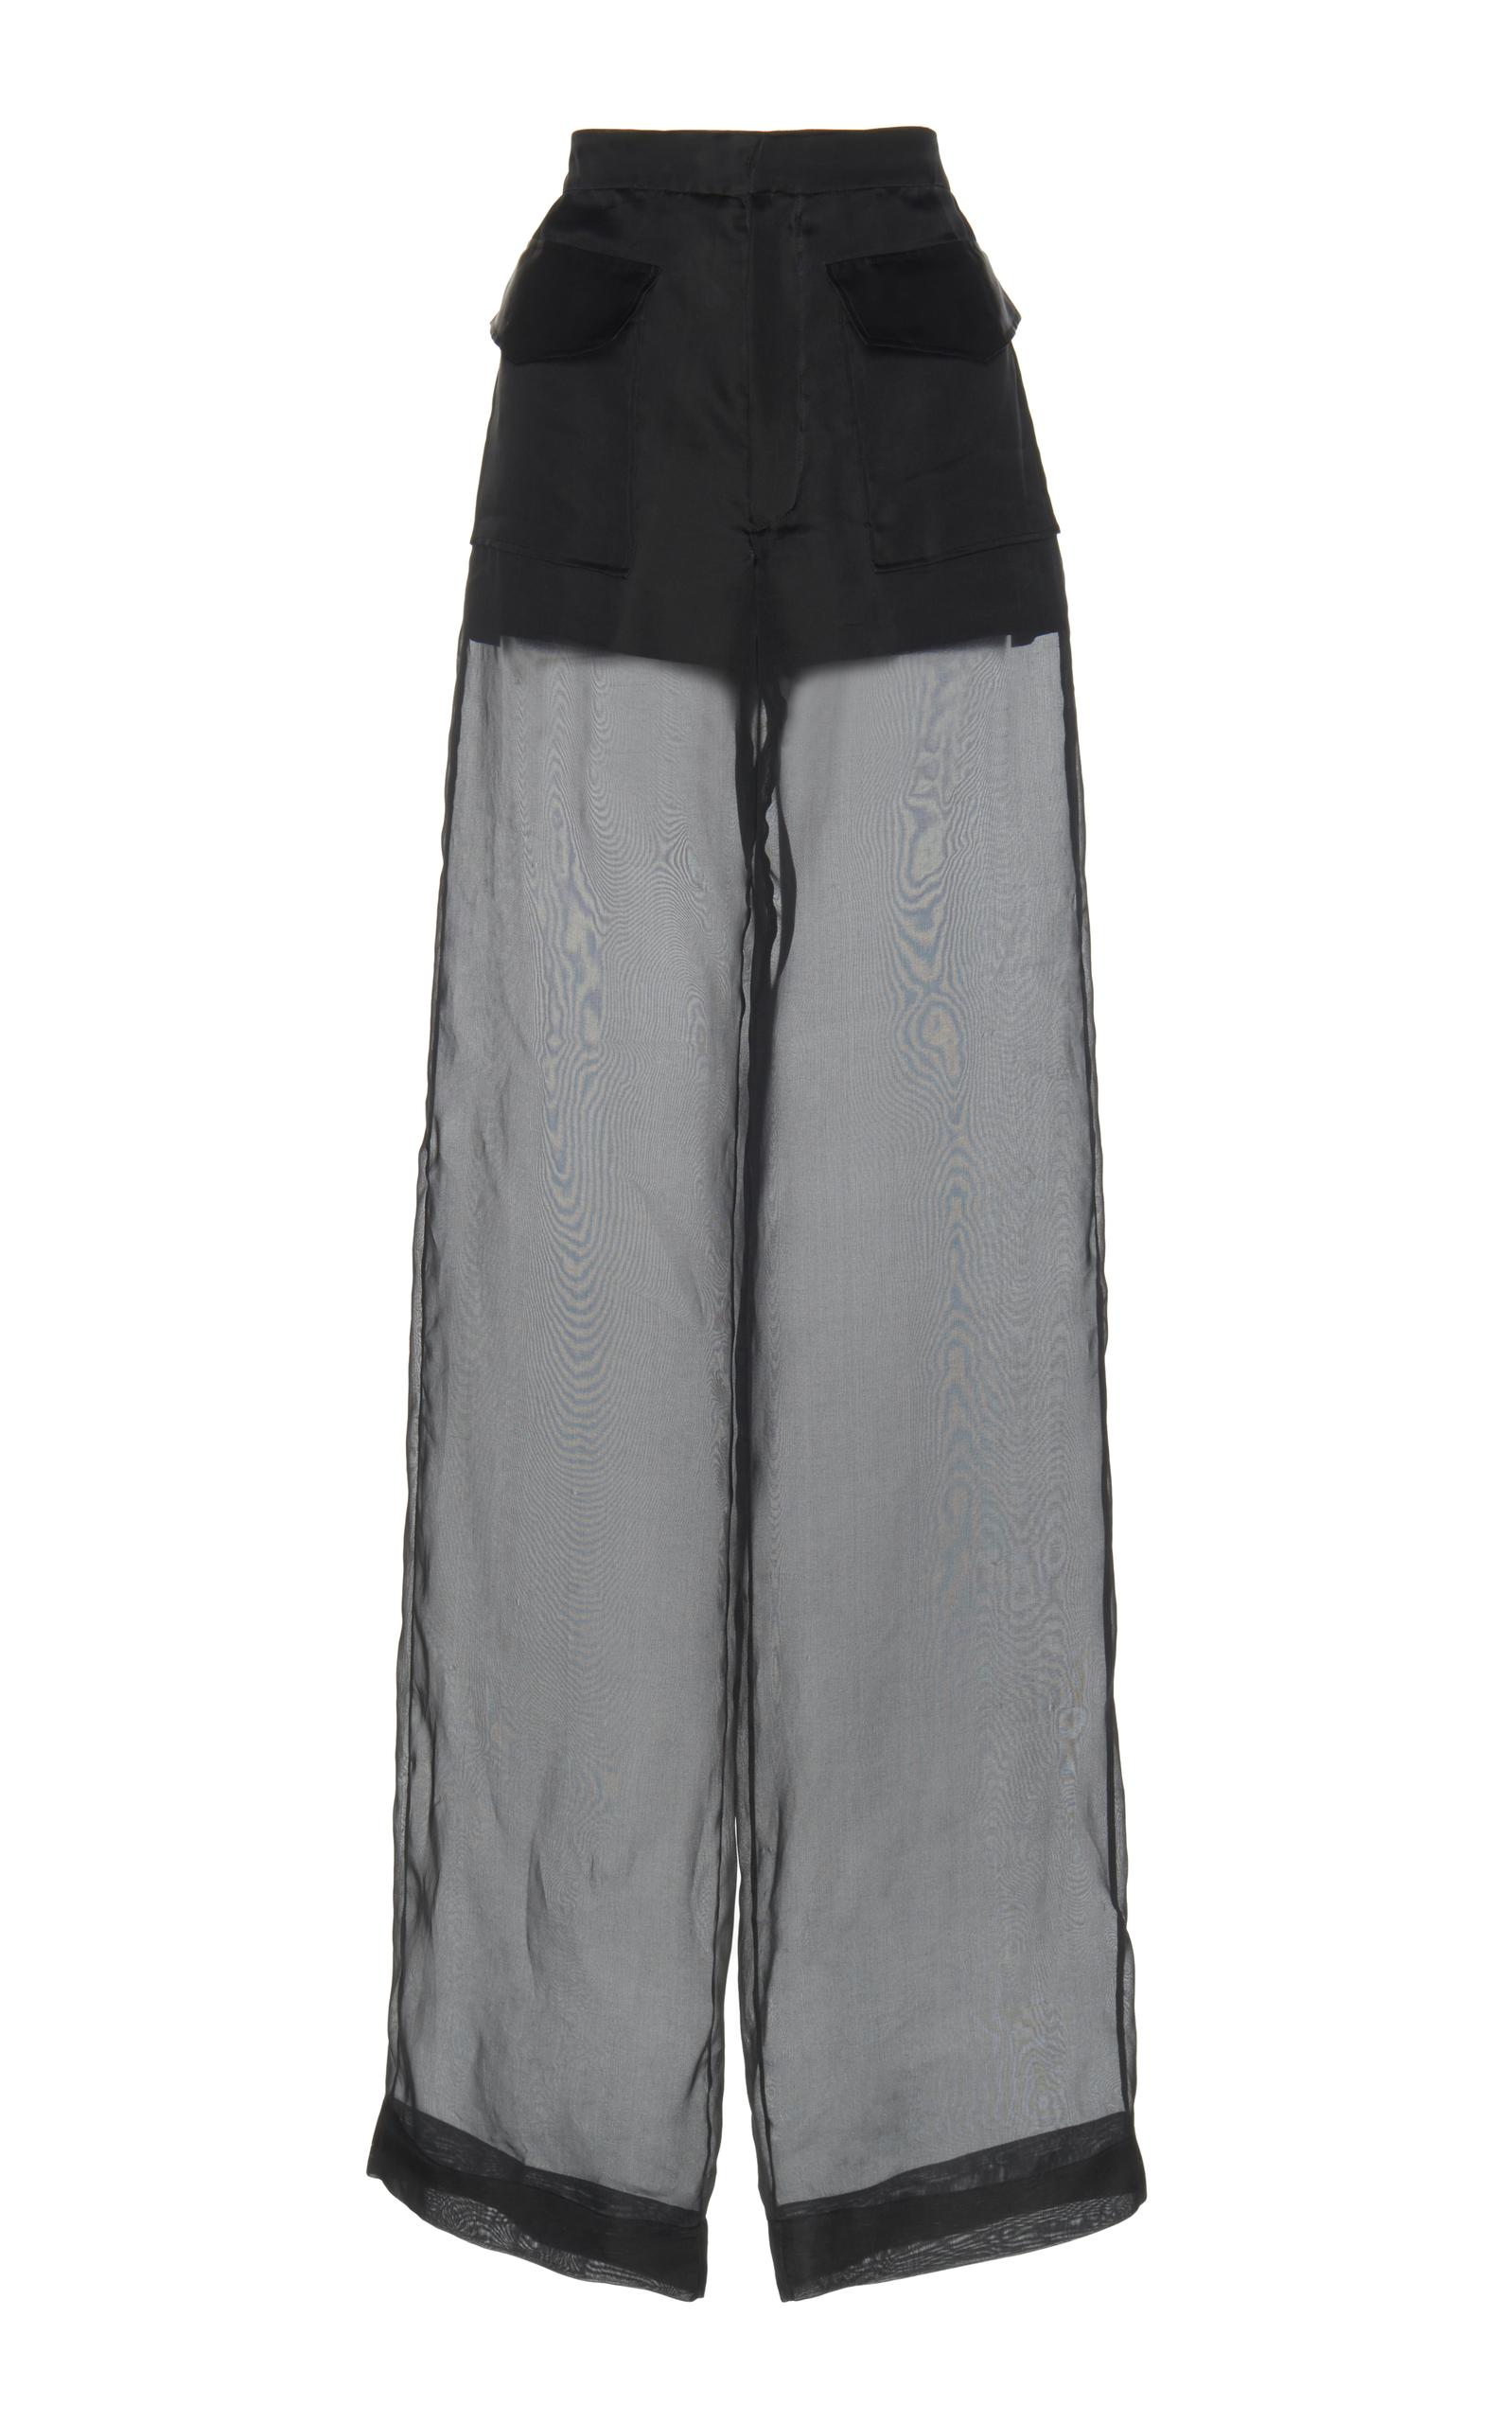 Maison Margiela  Silk Organza Sheer Pants